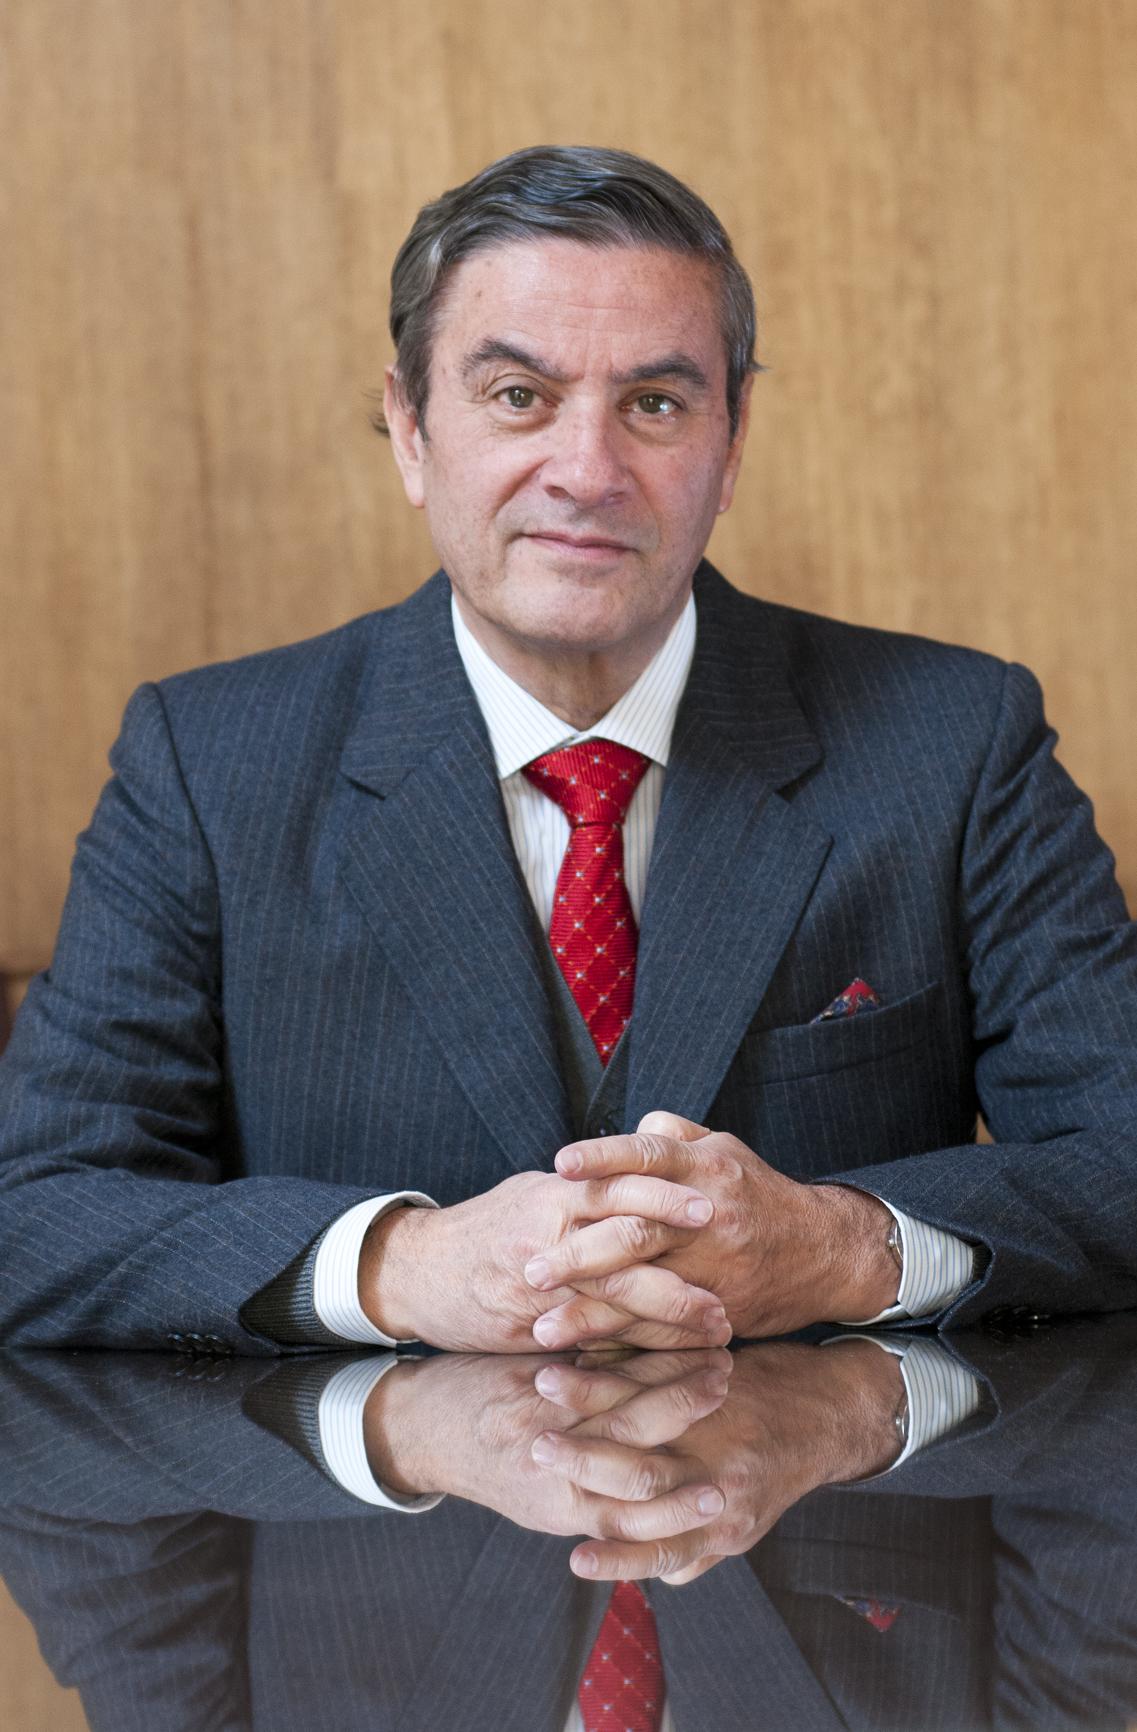 Jose Manuel Casanueva